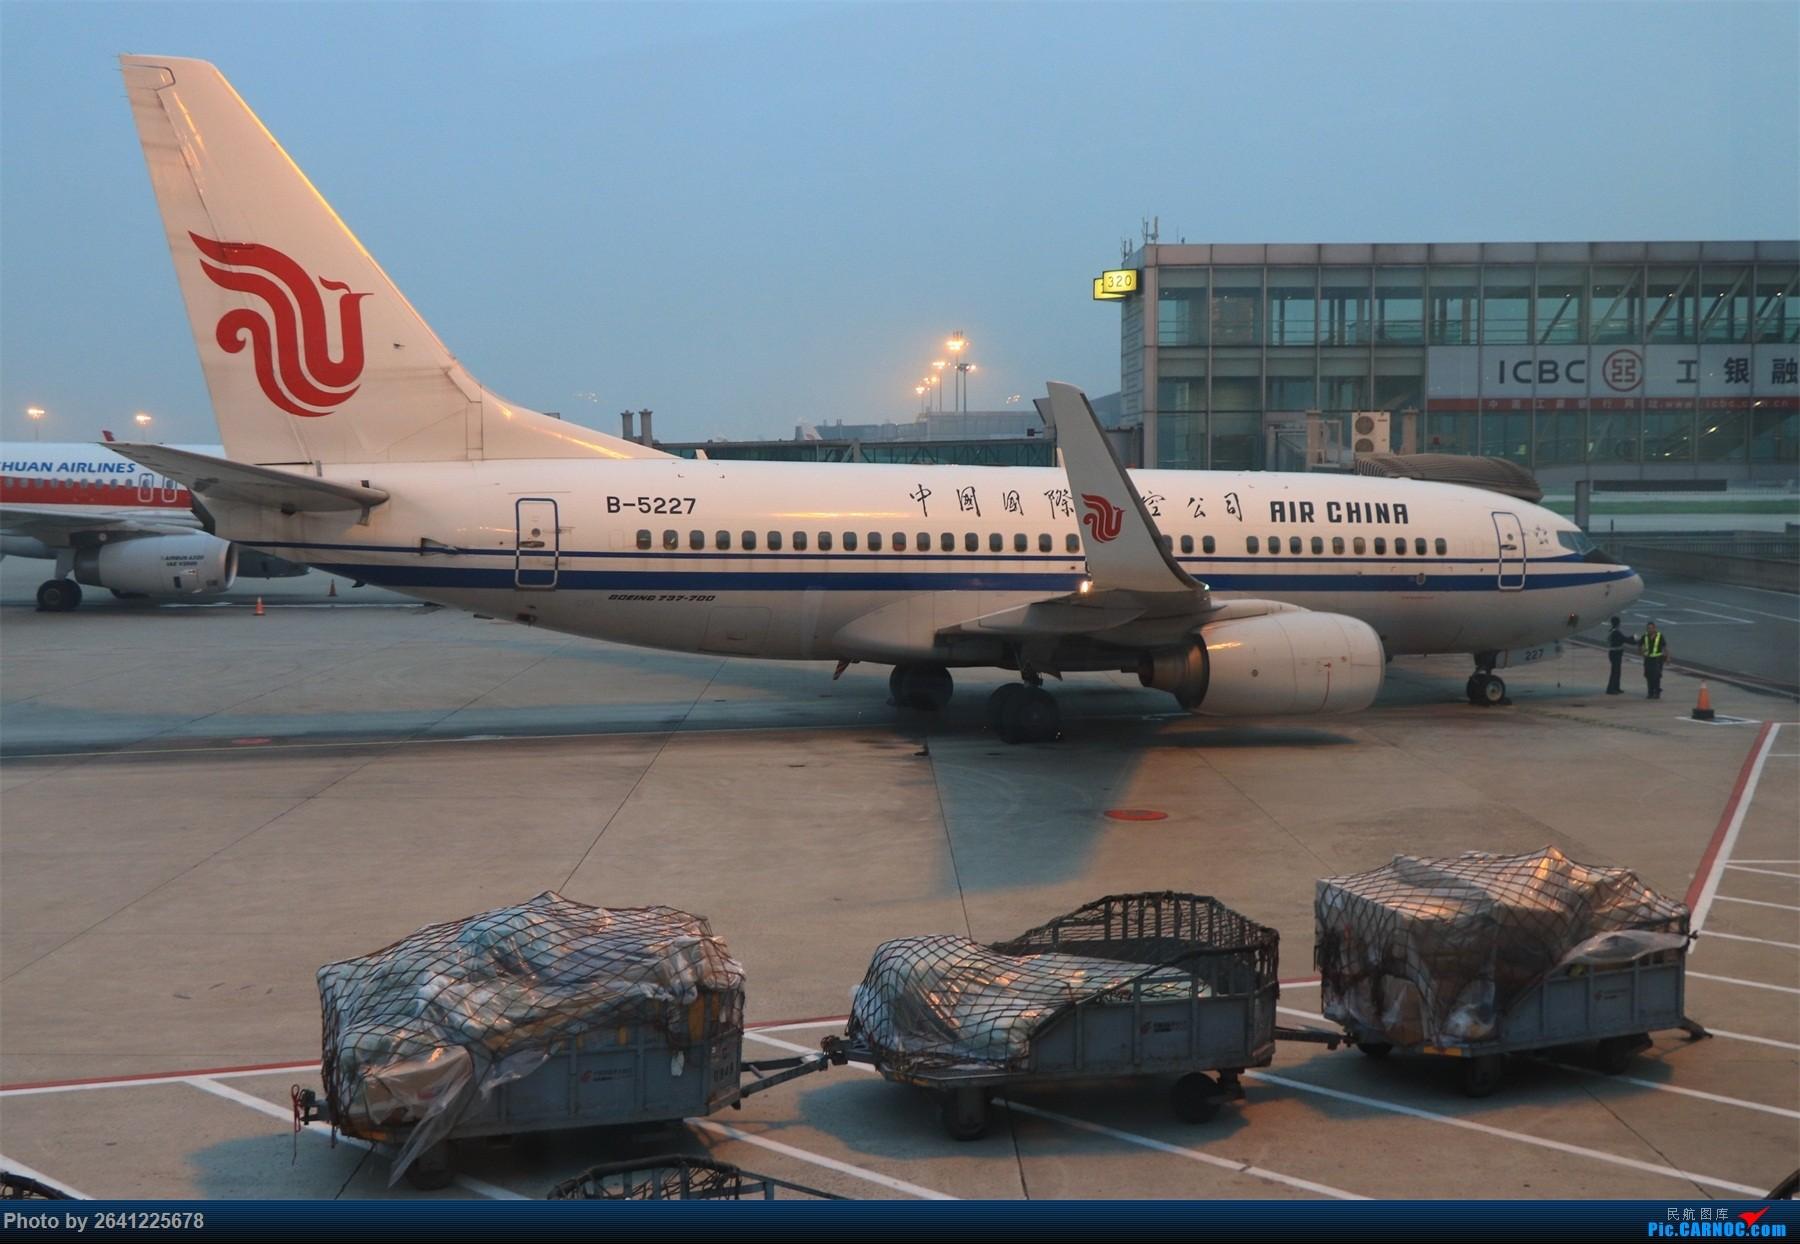 Re:[原创]【和小周飞拍世界第4集】空铁联运回家乡,长白延边好风光(家庭出游+探亲吉林6日游)*****更新至延吉部分,有FLIGHT LOG***** BOEING 737-700 B-5227 中国北京首都国际机场